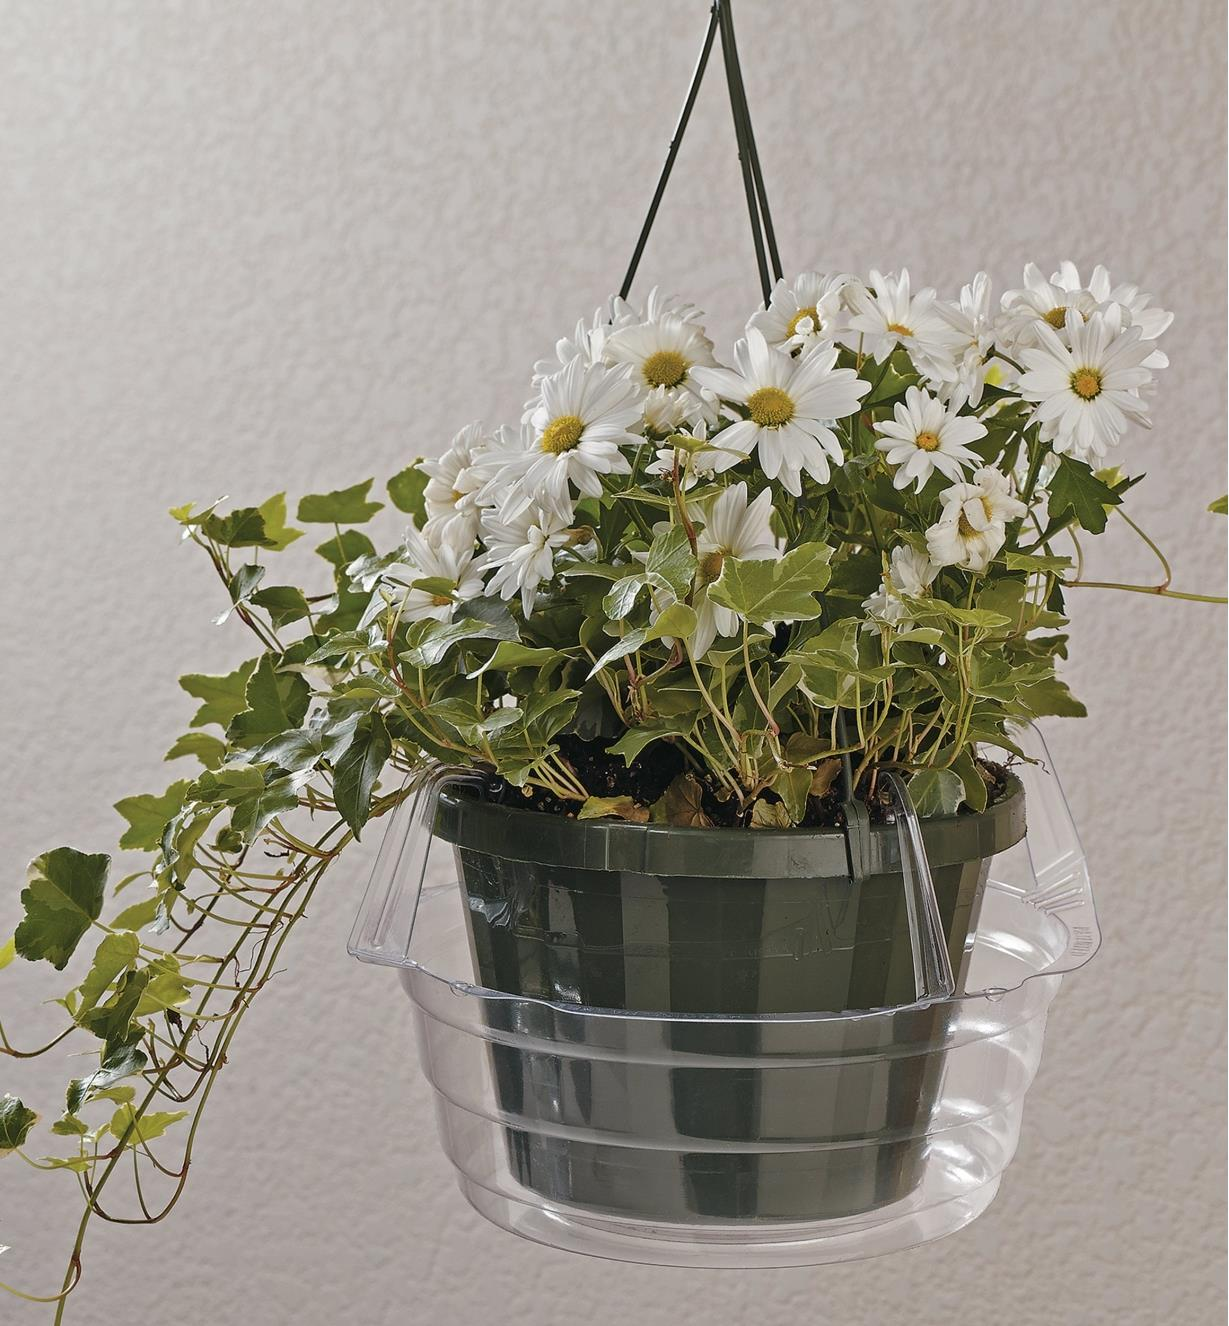 XB691 - Basin for Hanging Pots